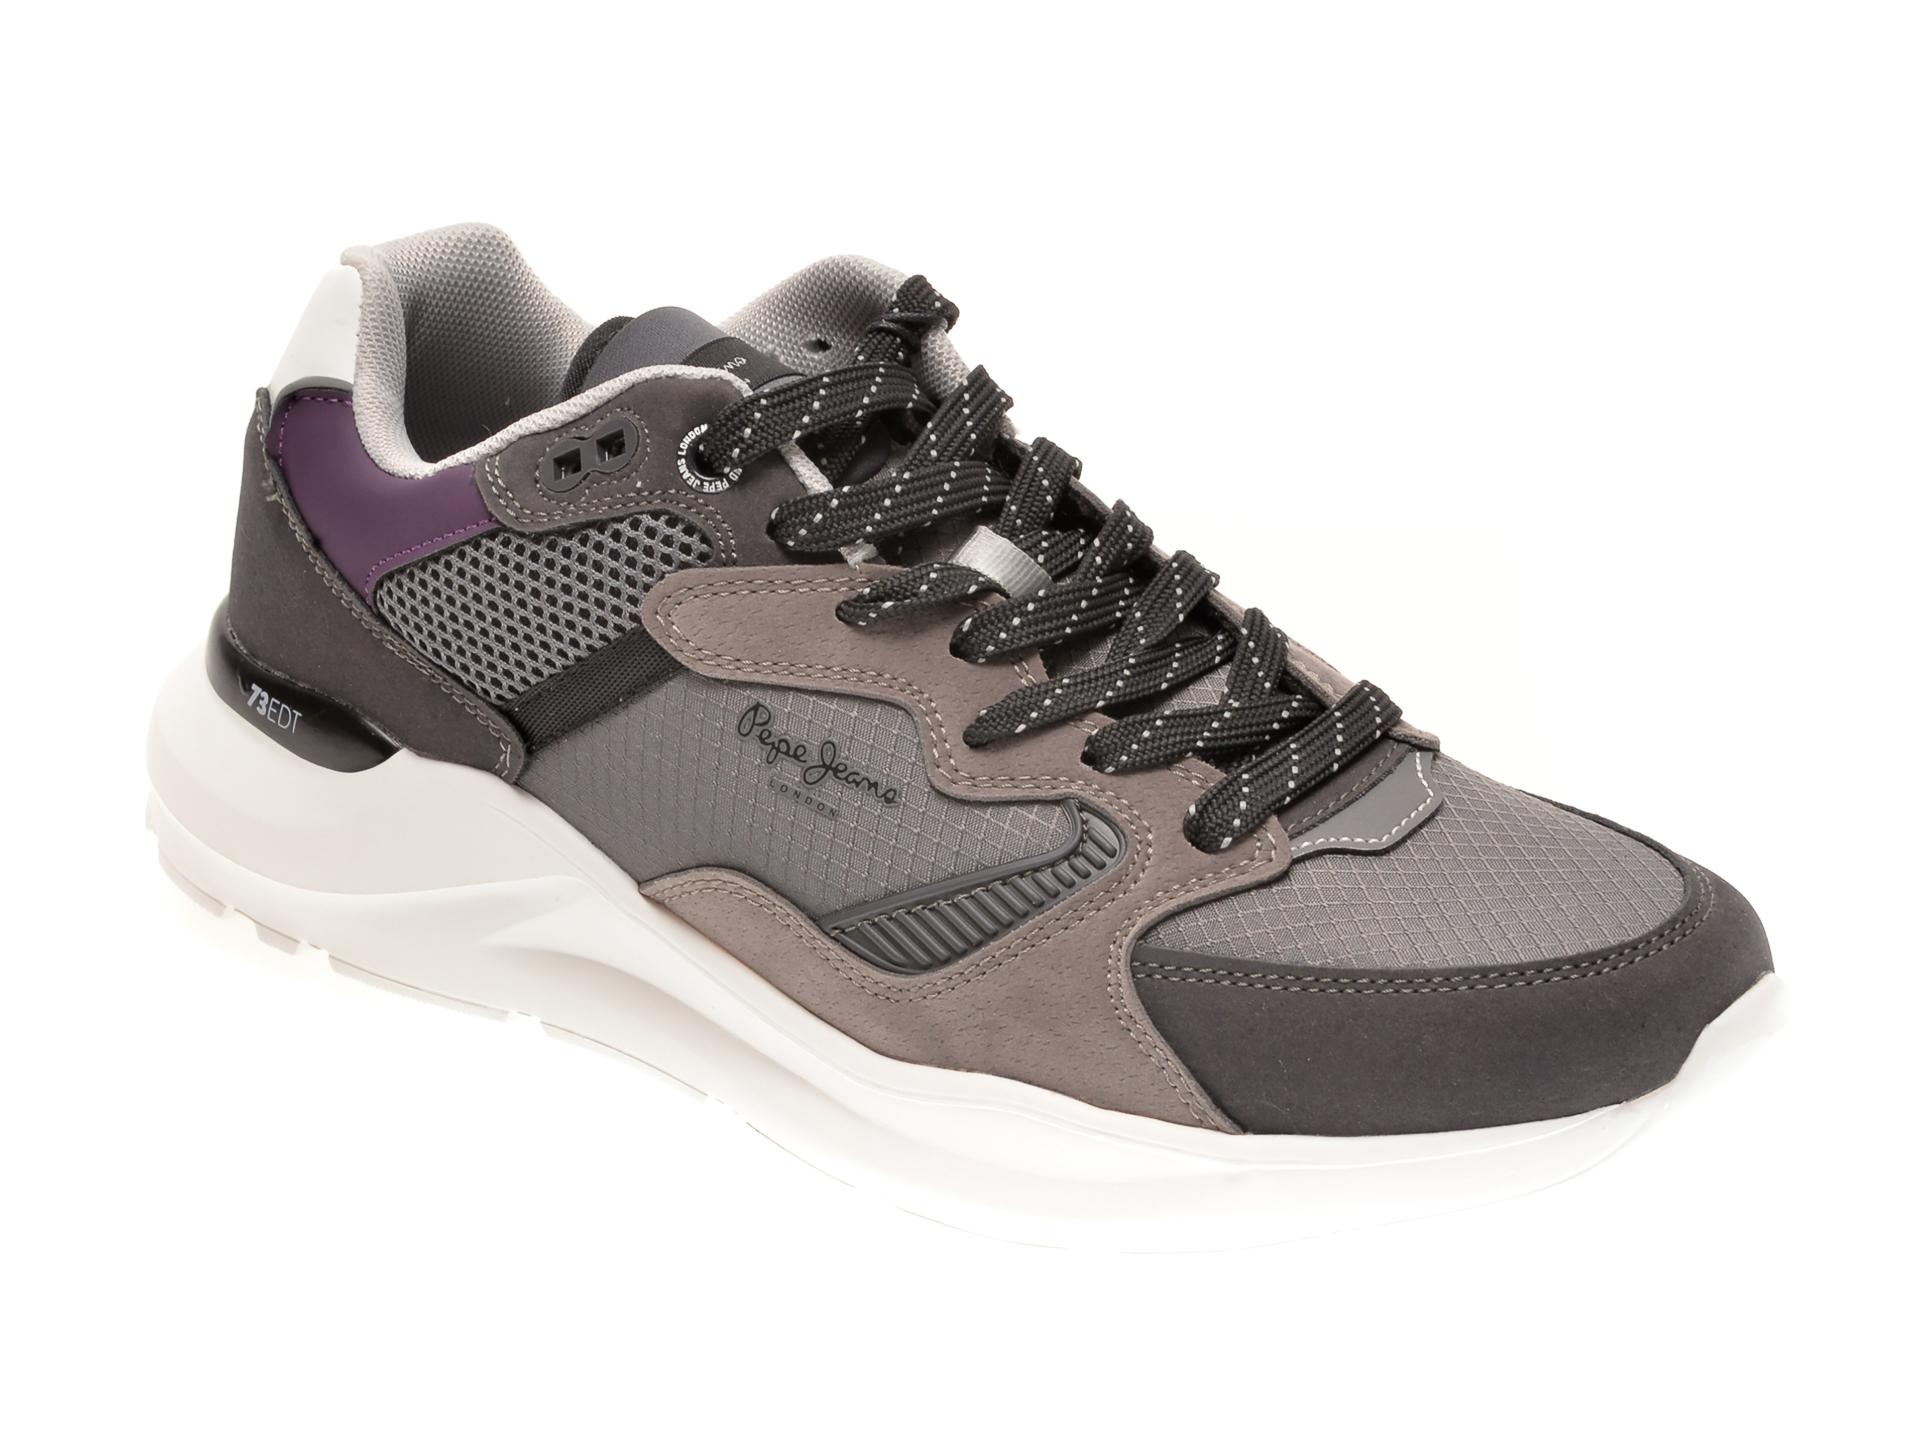 Pantofi sport PEPE JEANS gri, MS30666, din material textil si piele ecologica imagine